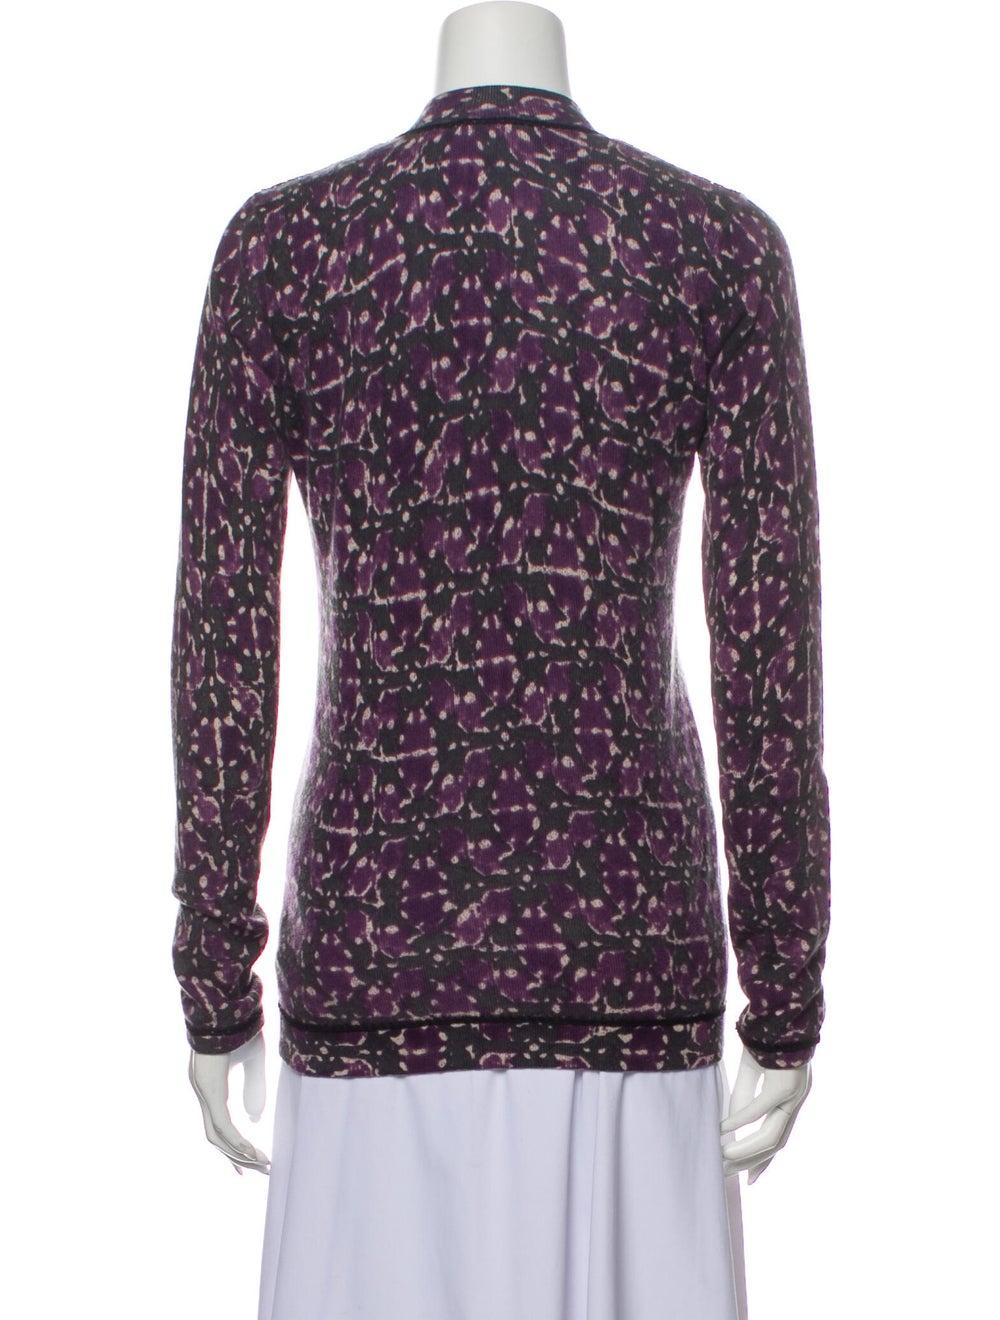 TSE Cashmere Cashmere Tie-Dye Print Sweater Purple - image 3